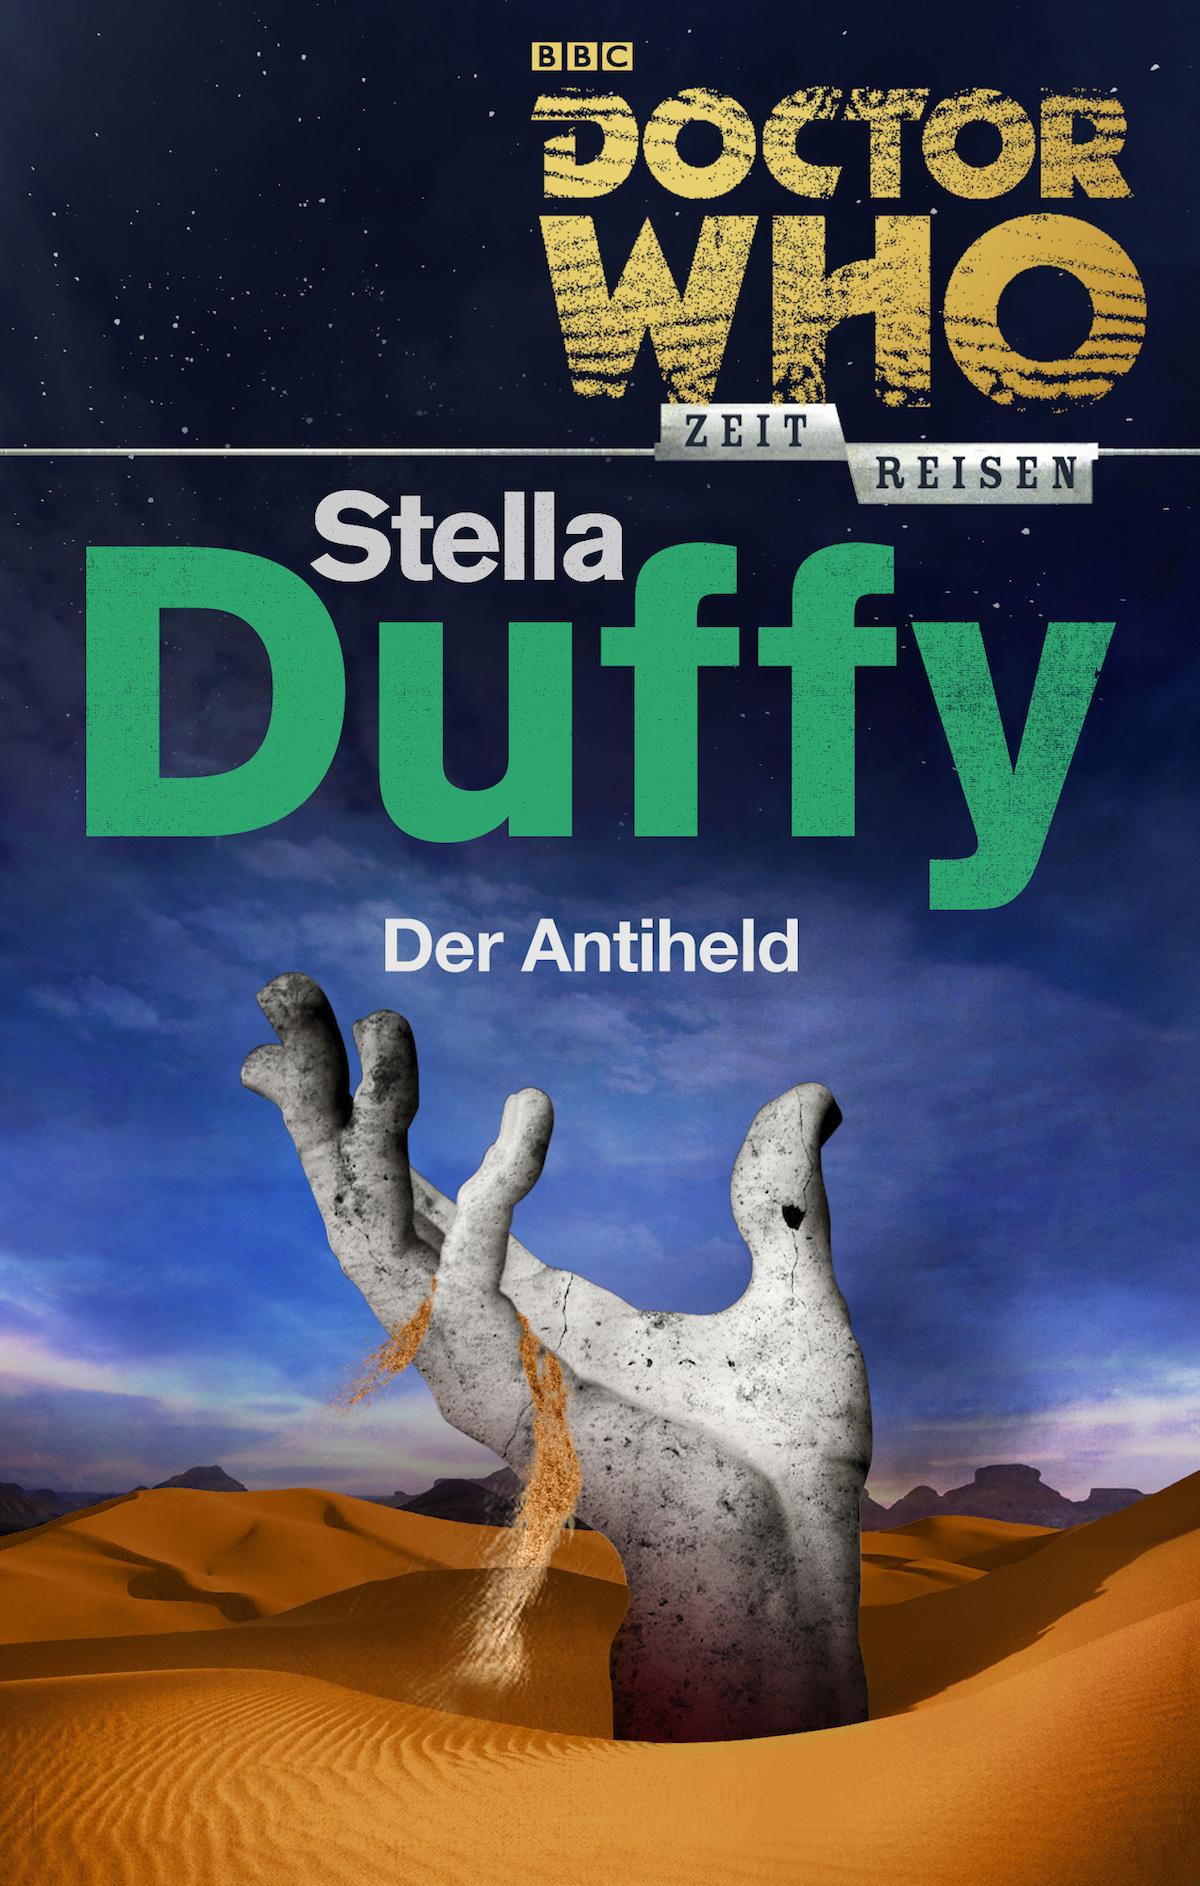 Neuer Autor ww1 fiction homosexuell 2007